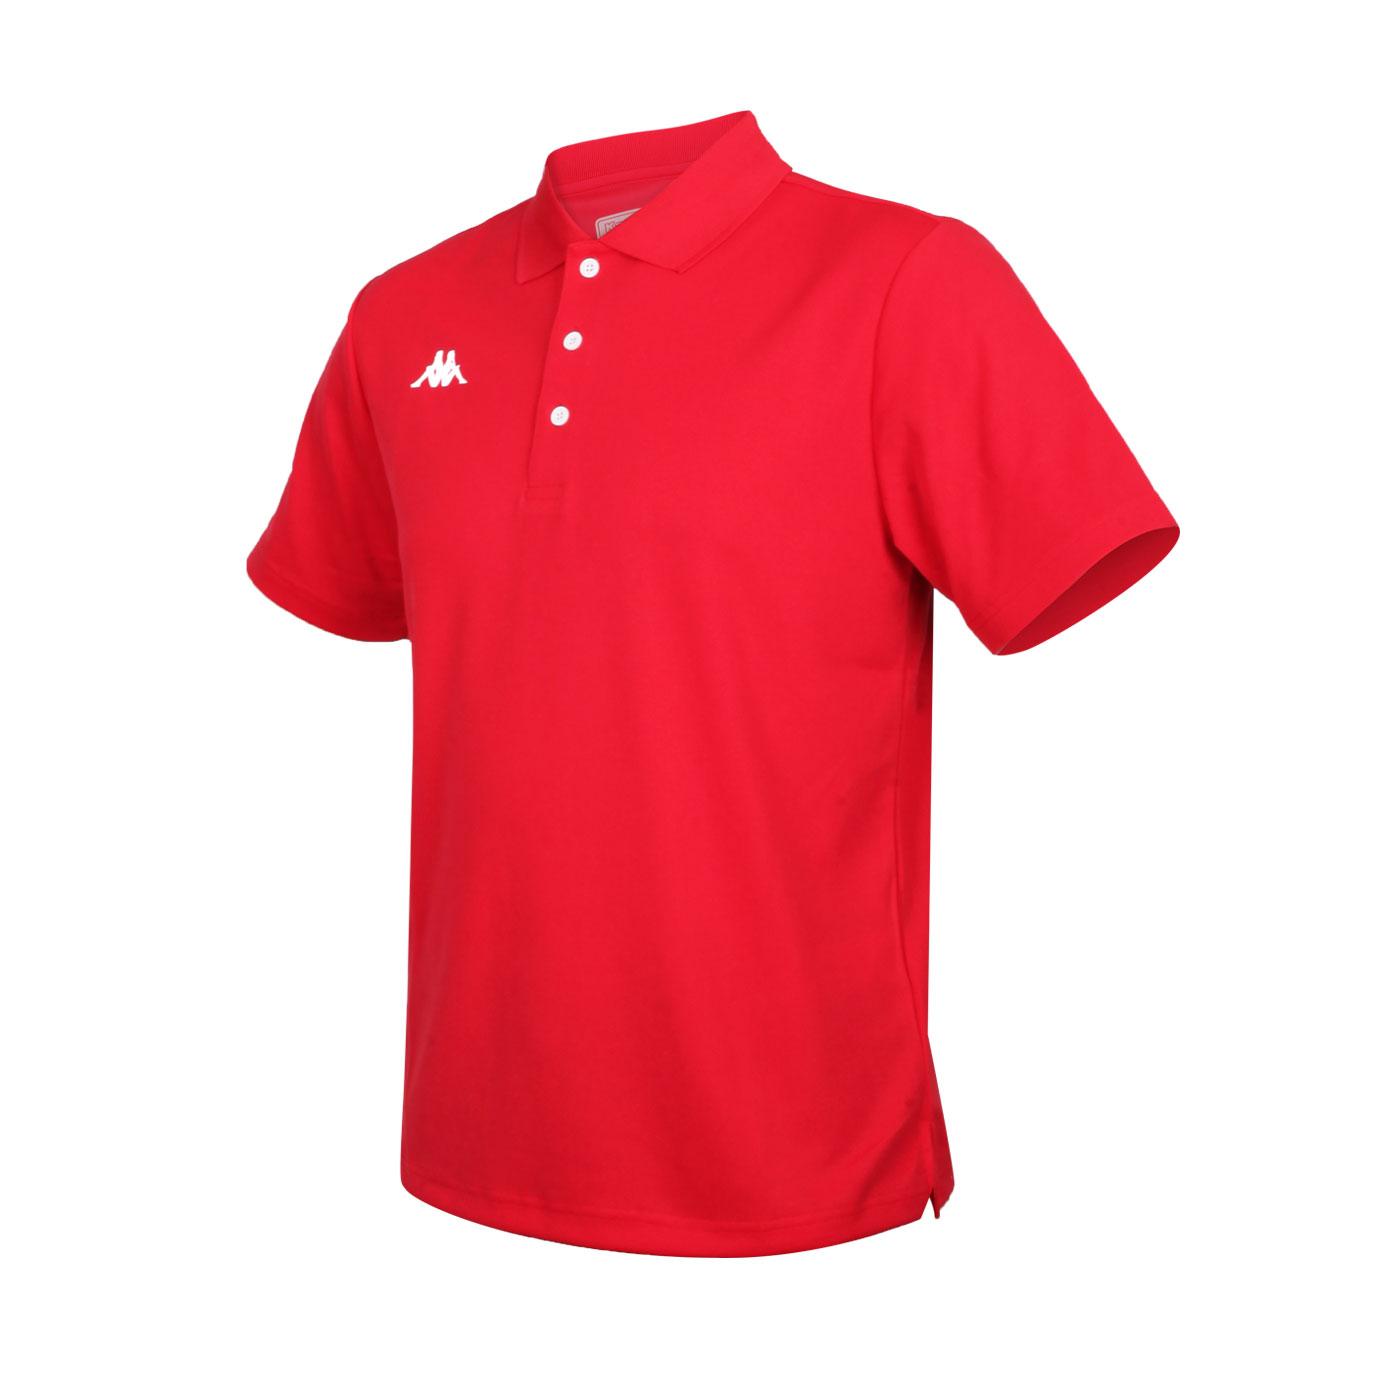 KAPPA 男款K4T短袖POLO衫 321762W-D18 - 紅白